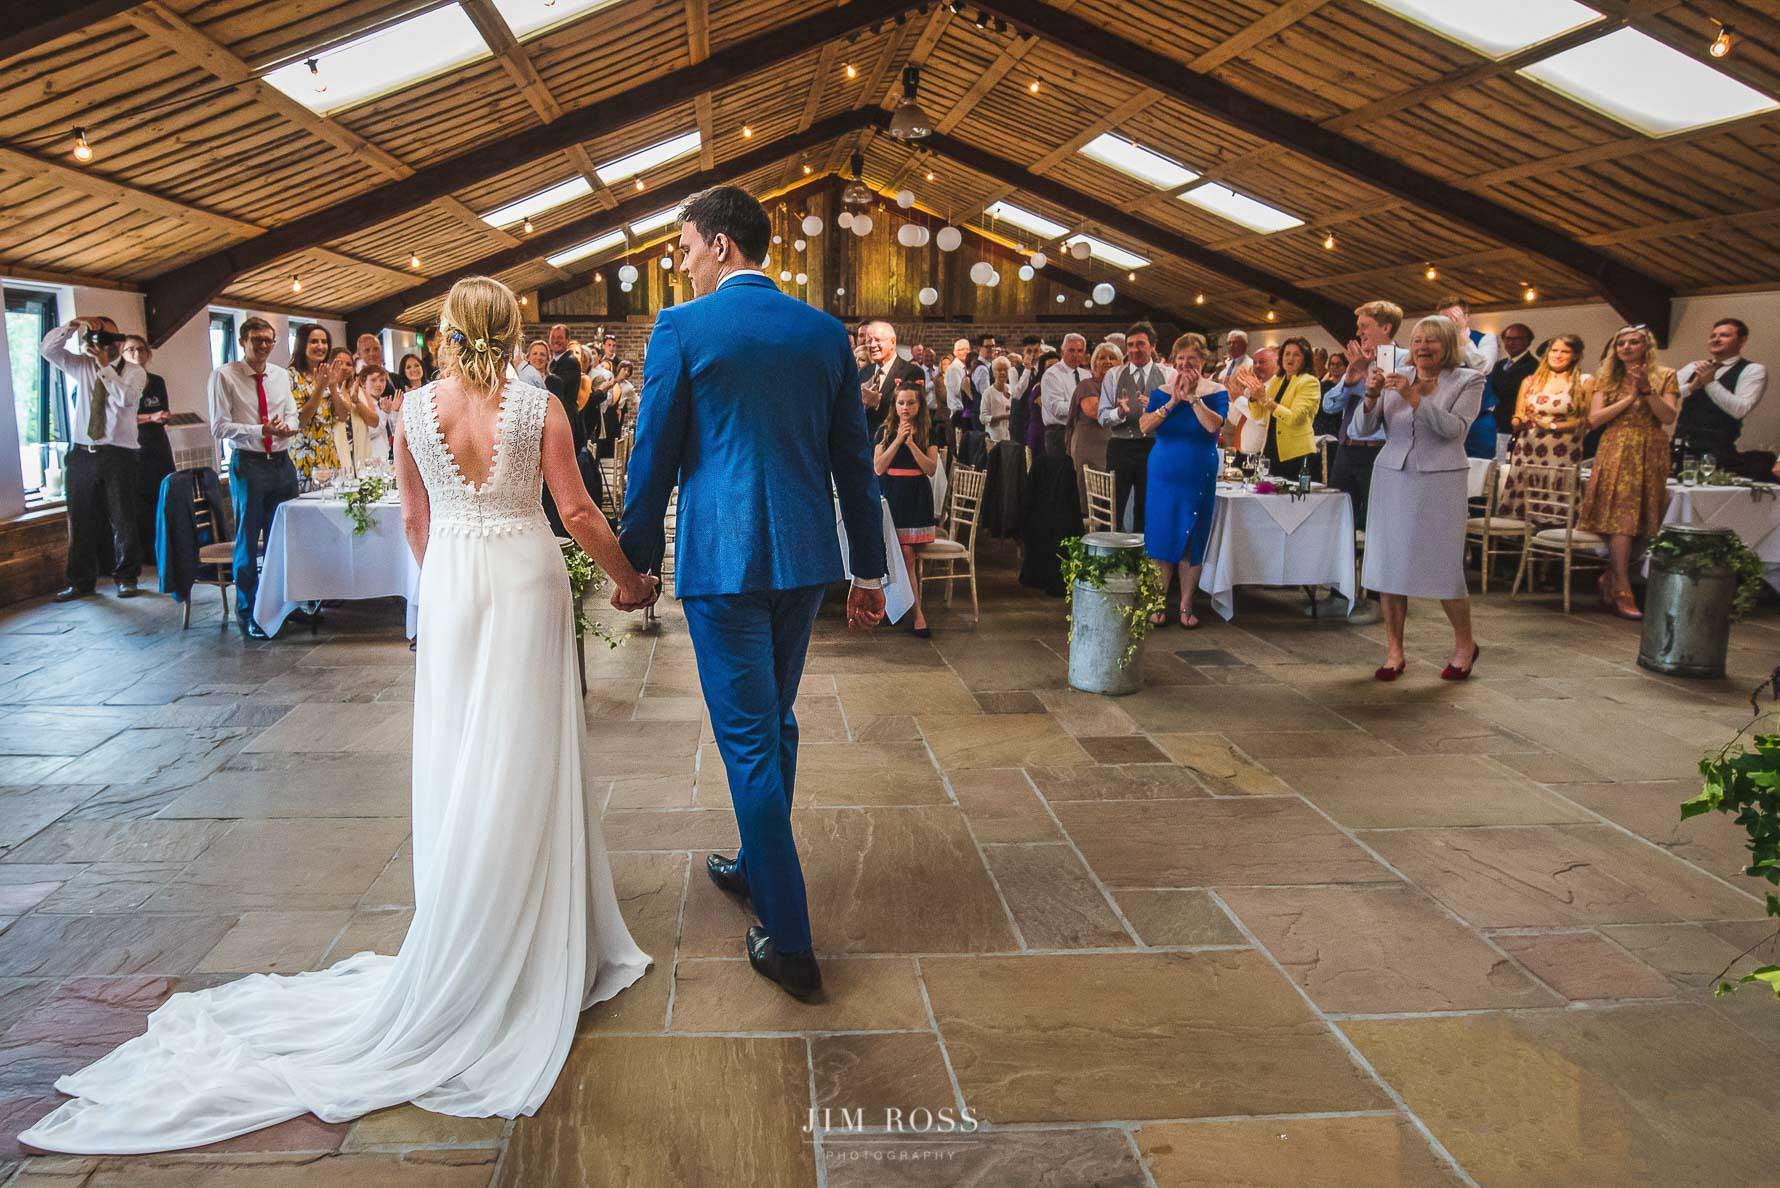 Newlyweds arrive at wedding breakfast